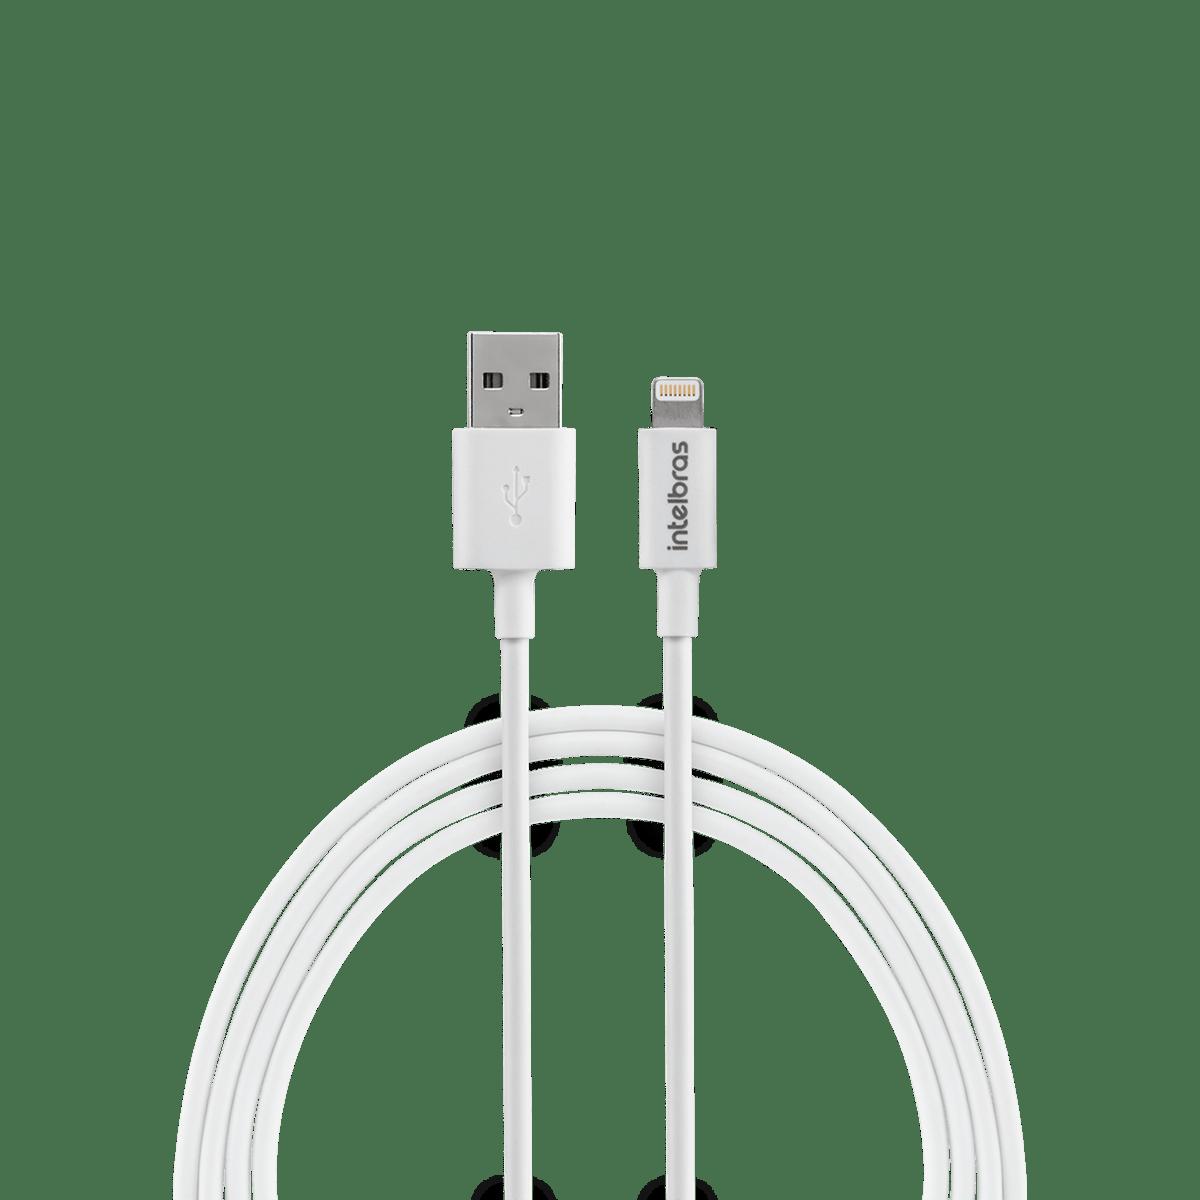 Cabo USB - Lightning 1,2m PVC branco Intelbras EUAL 12PB